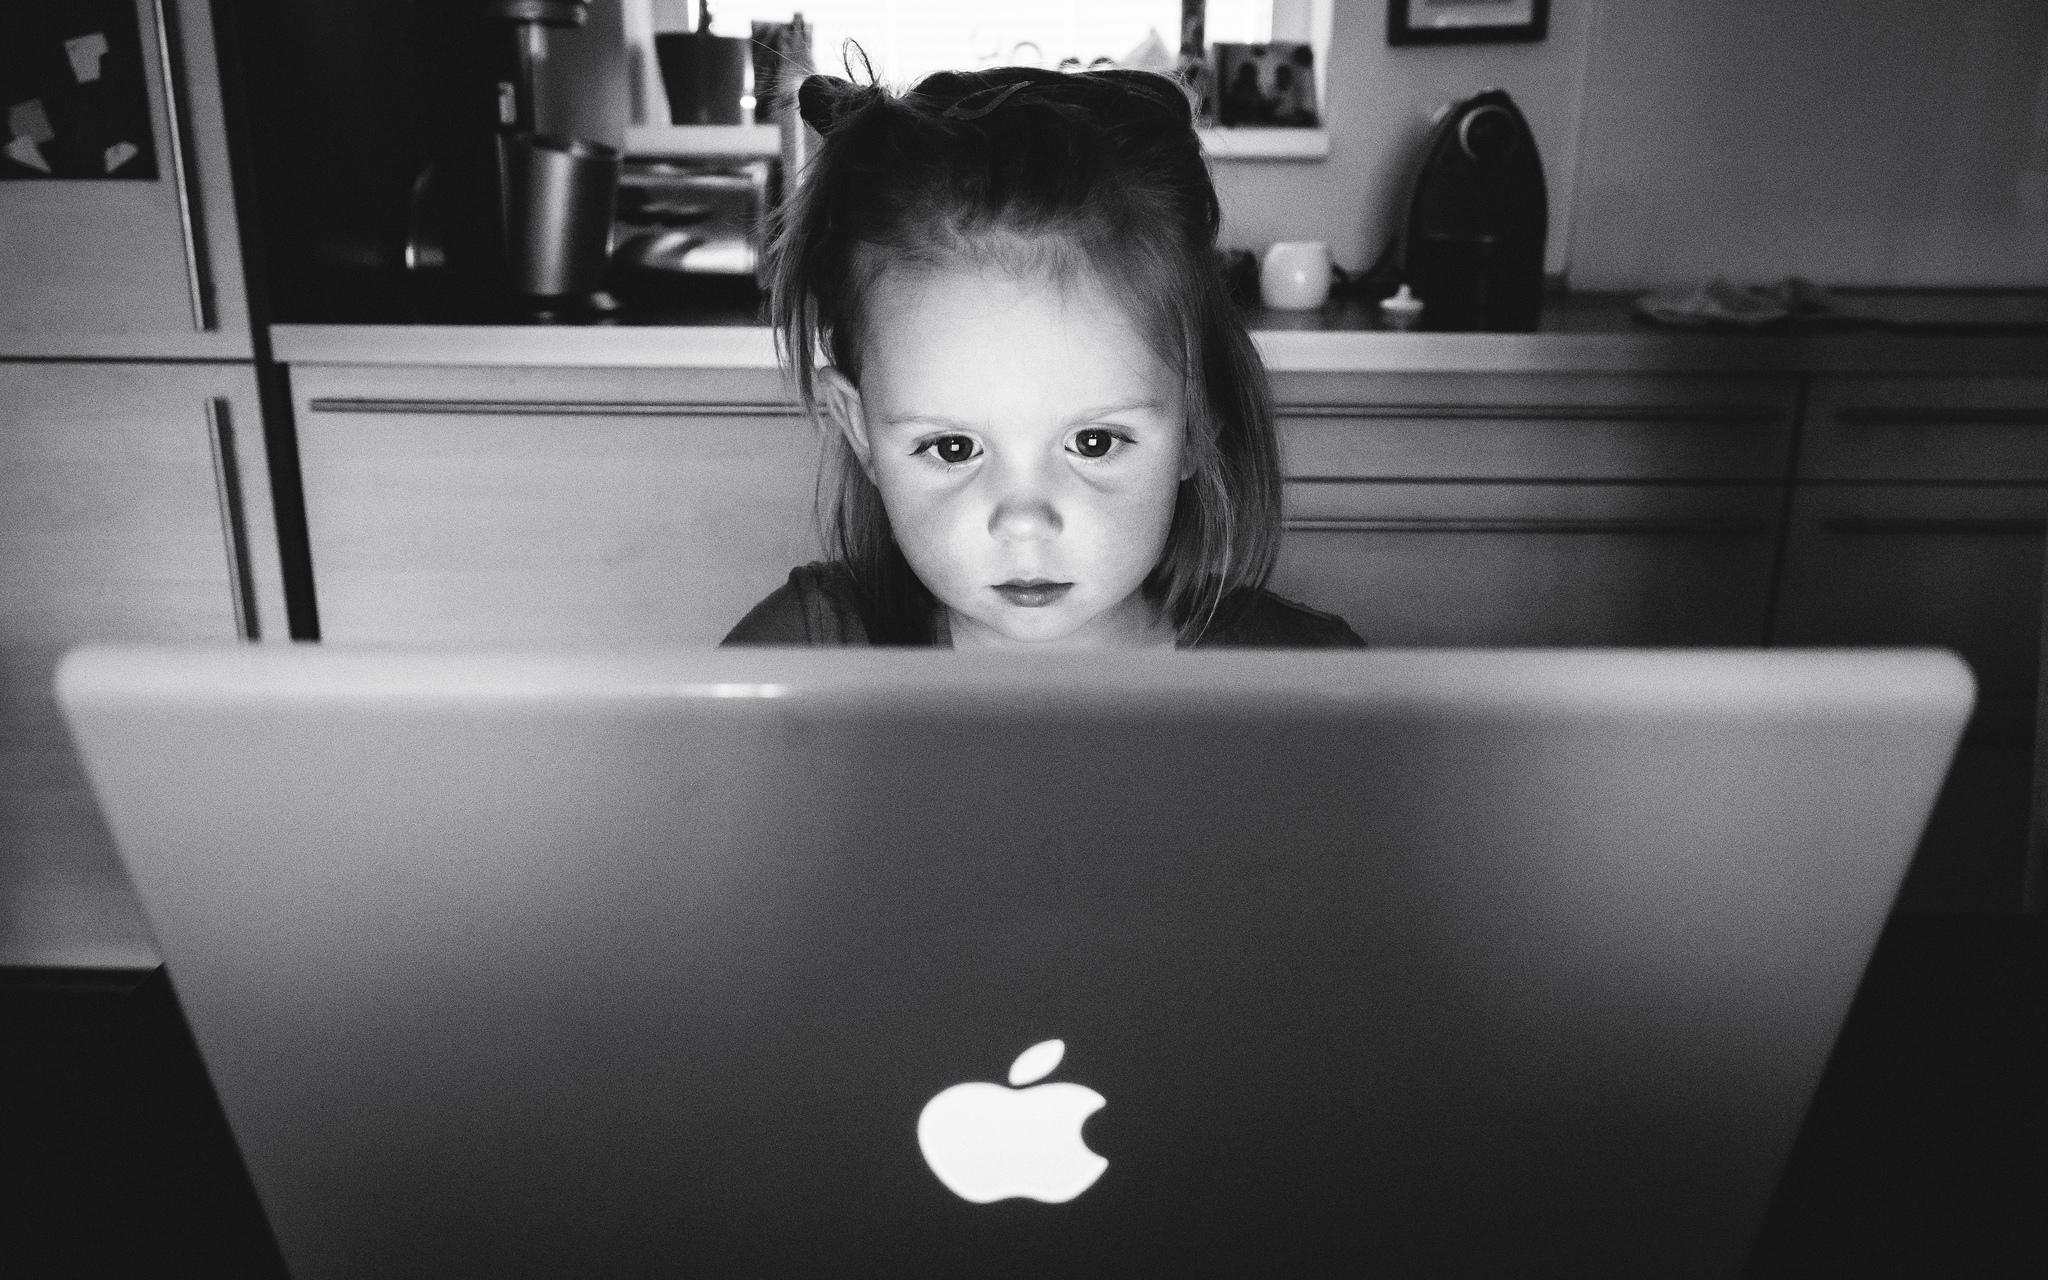 Cybersecurity in Schools